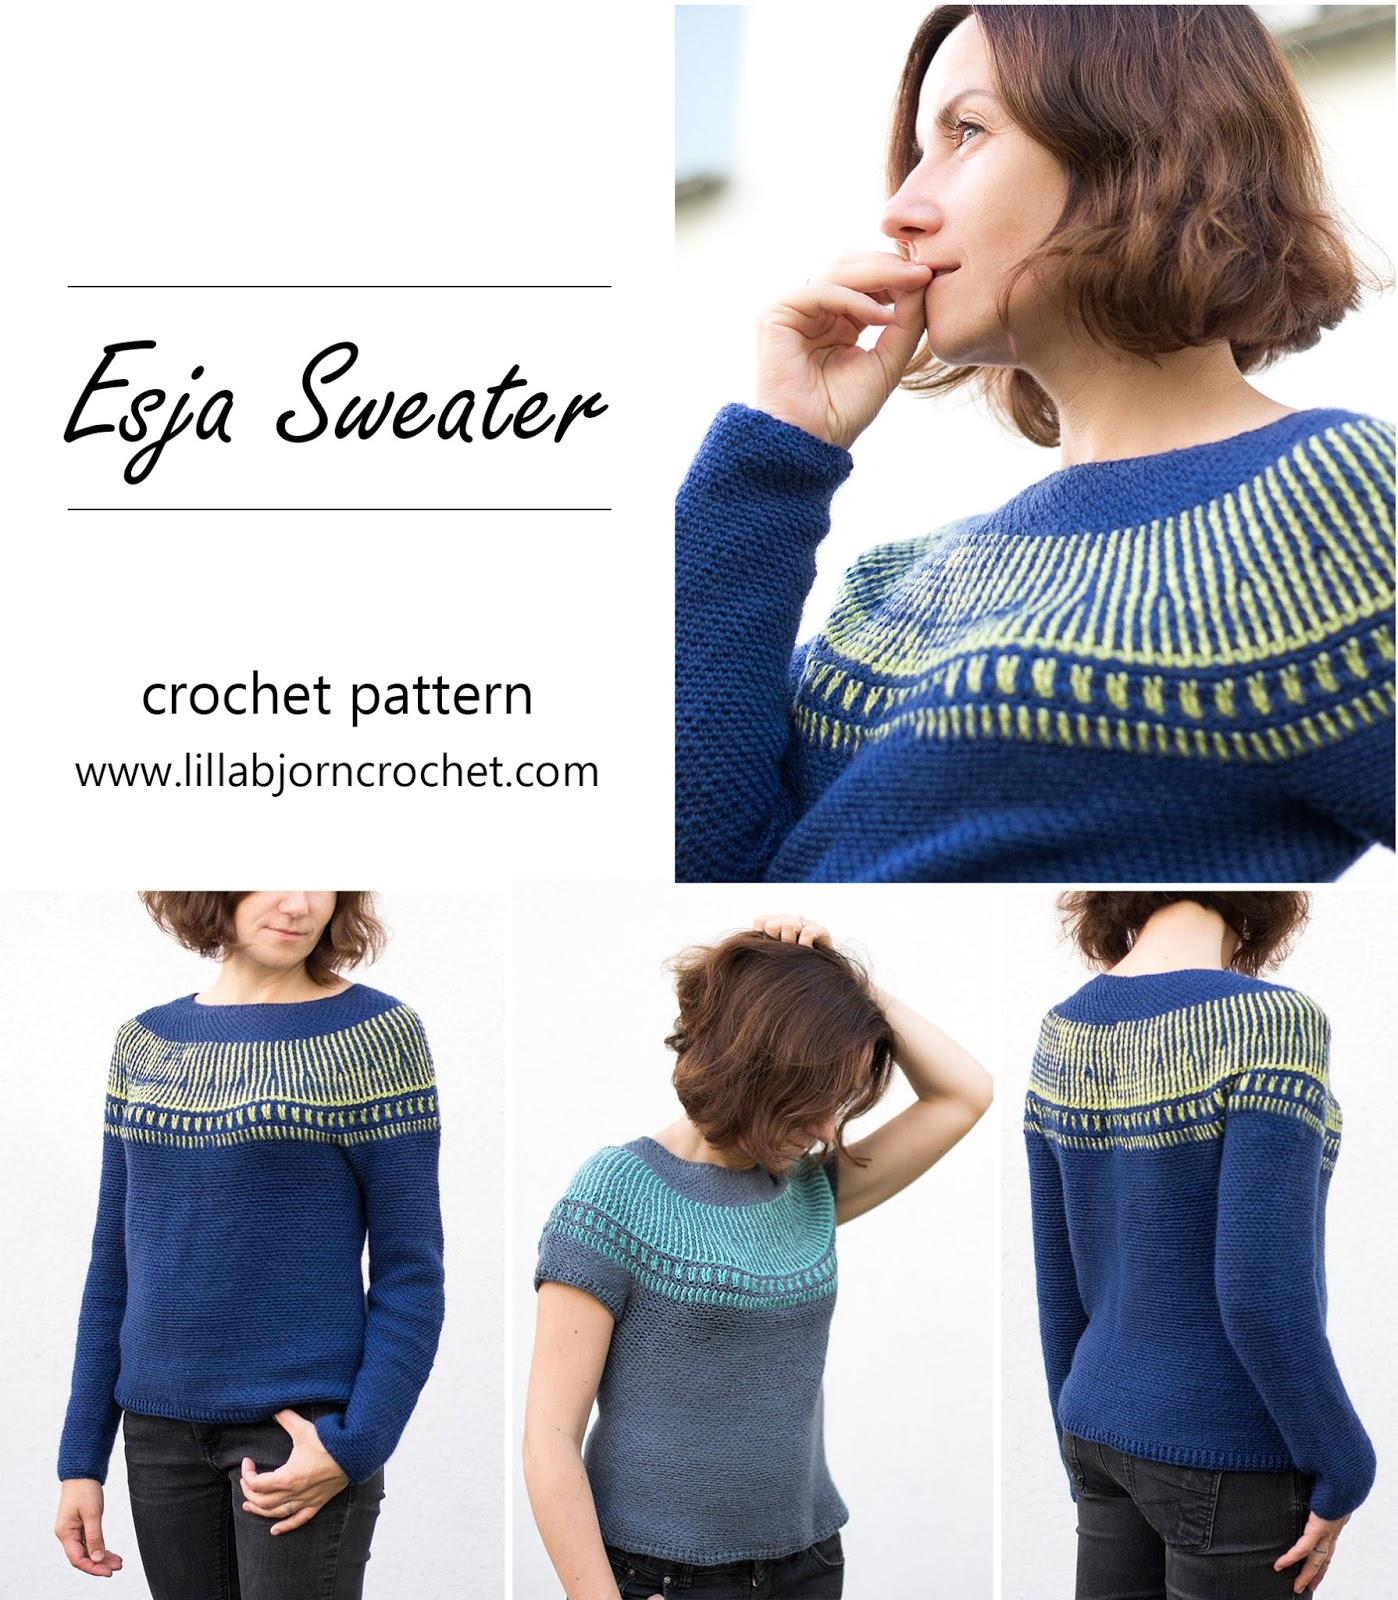 738821a0d718 Esja Sweater and Crochet Brioche  new pattern release